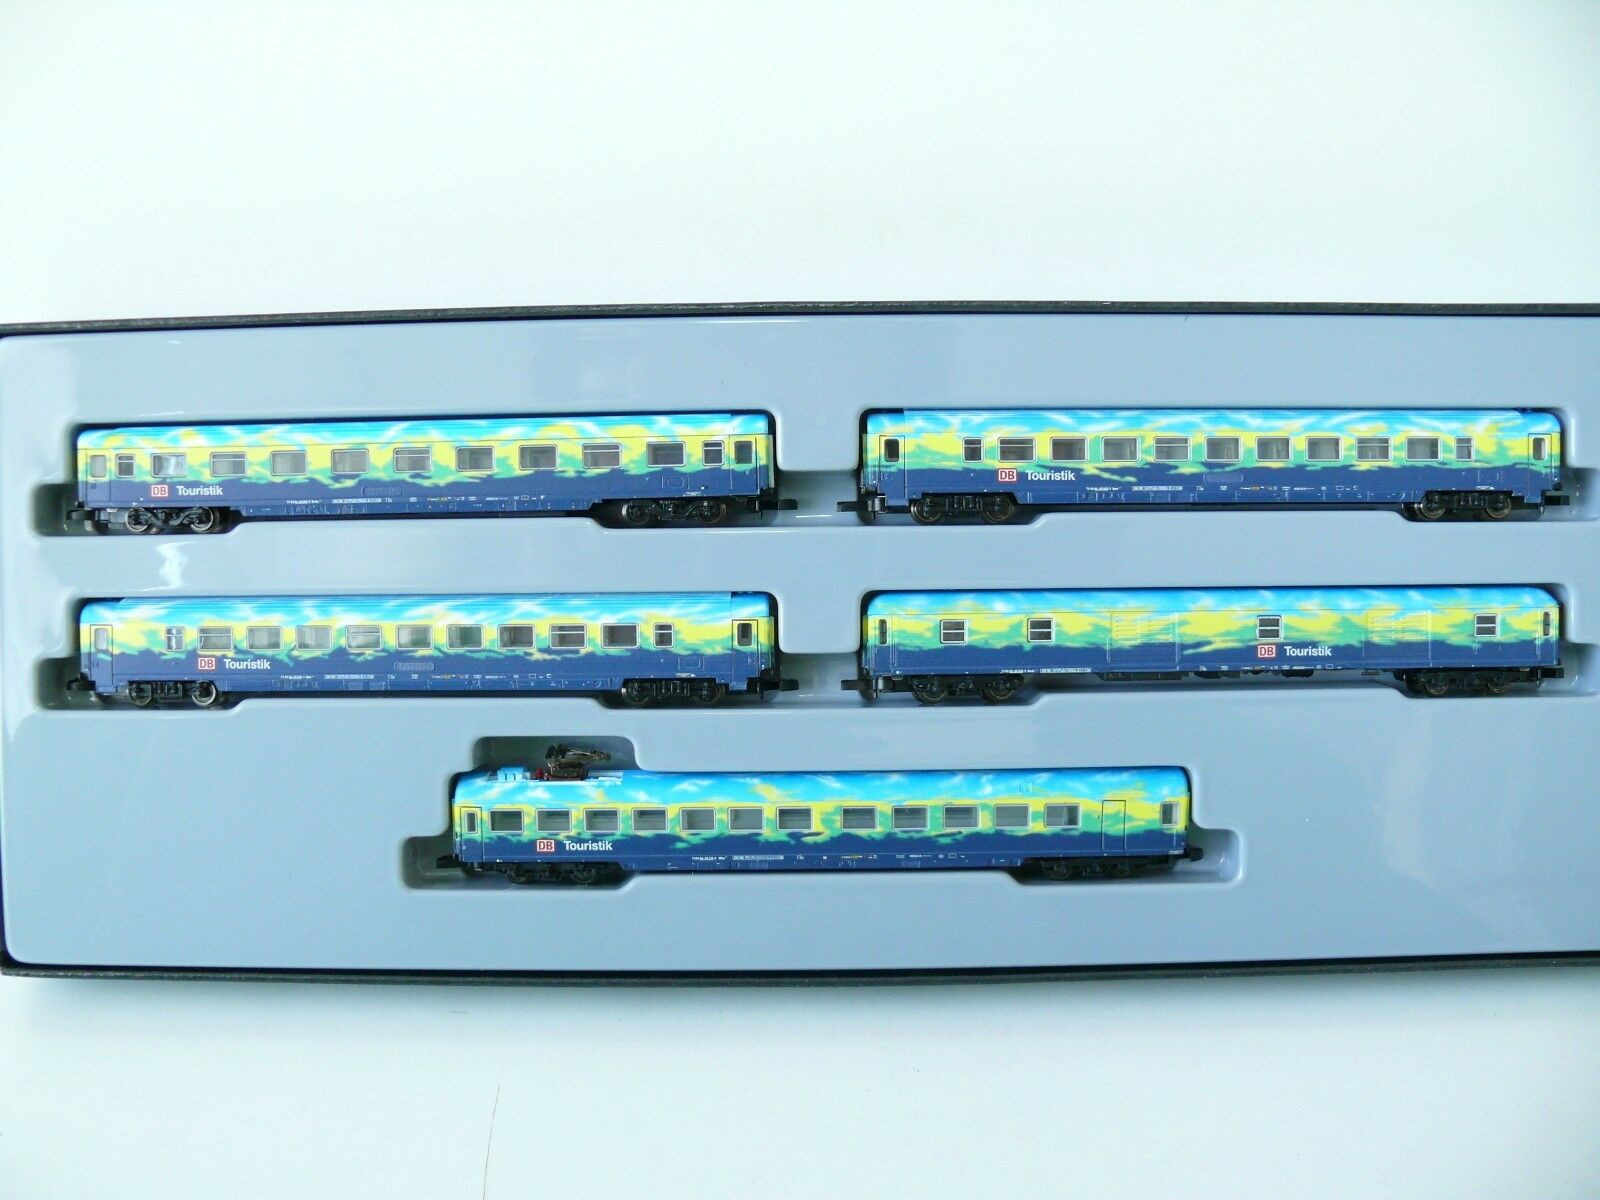 Z - 87303 vagoni-Set 2  touristikzug  delle DB AG-NUOVO & OVP